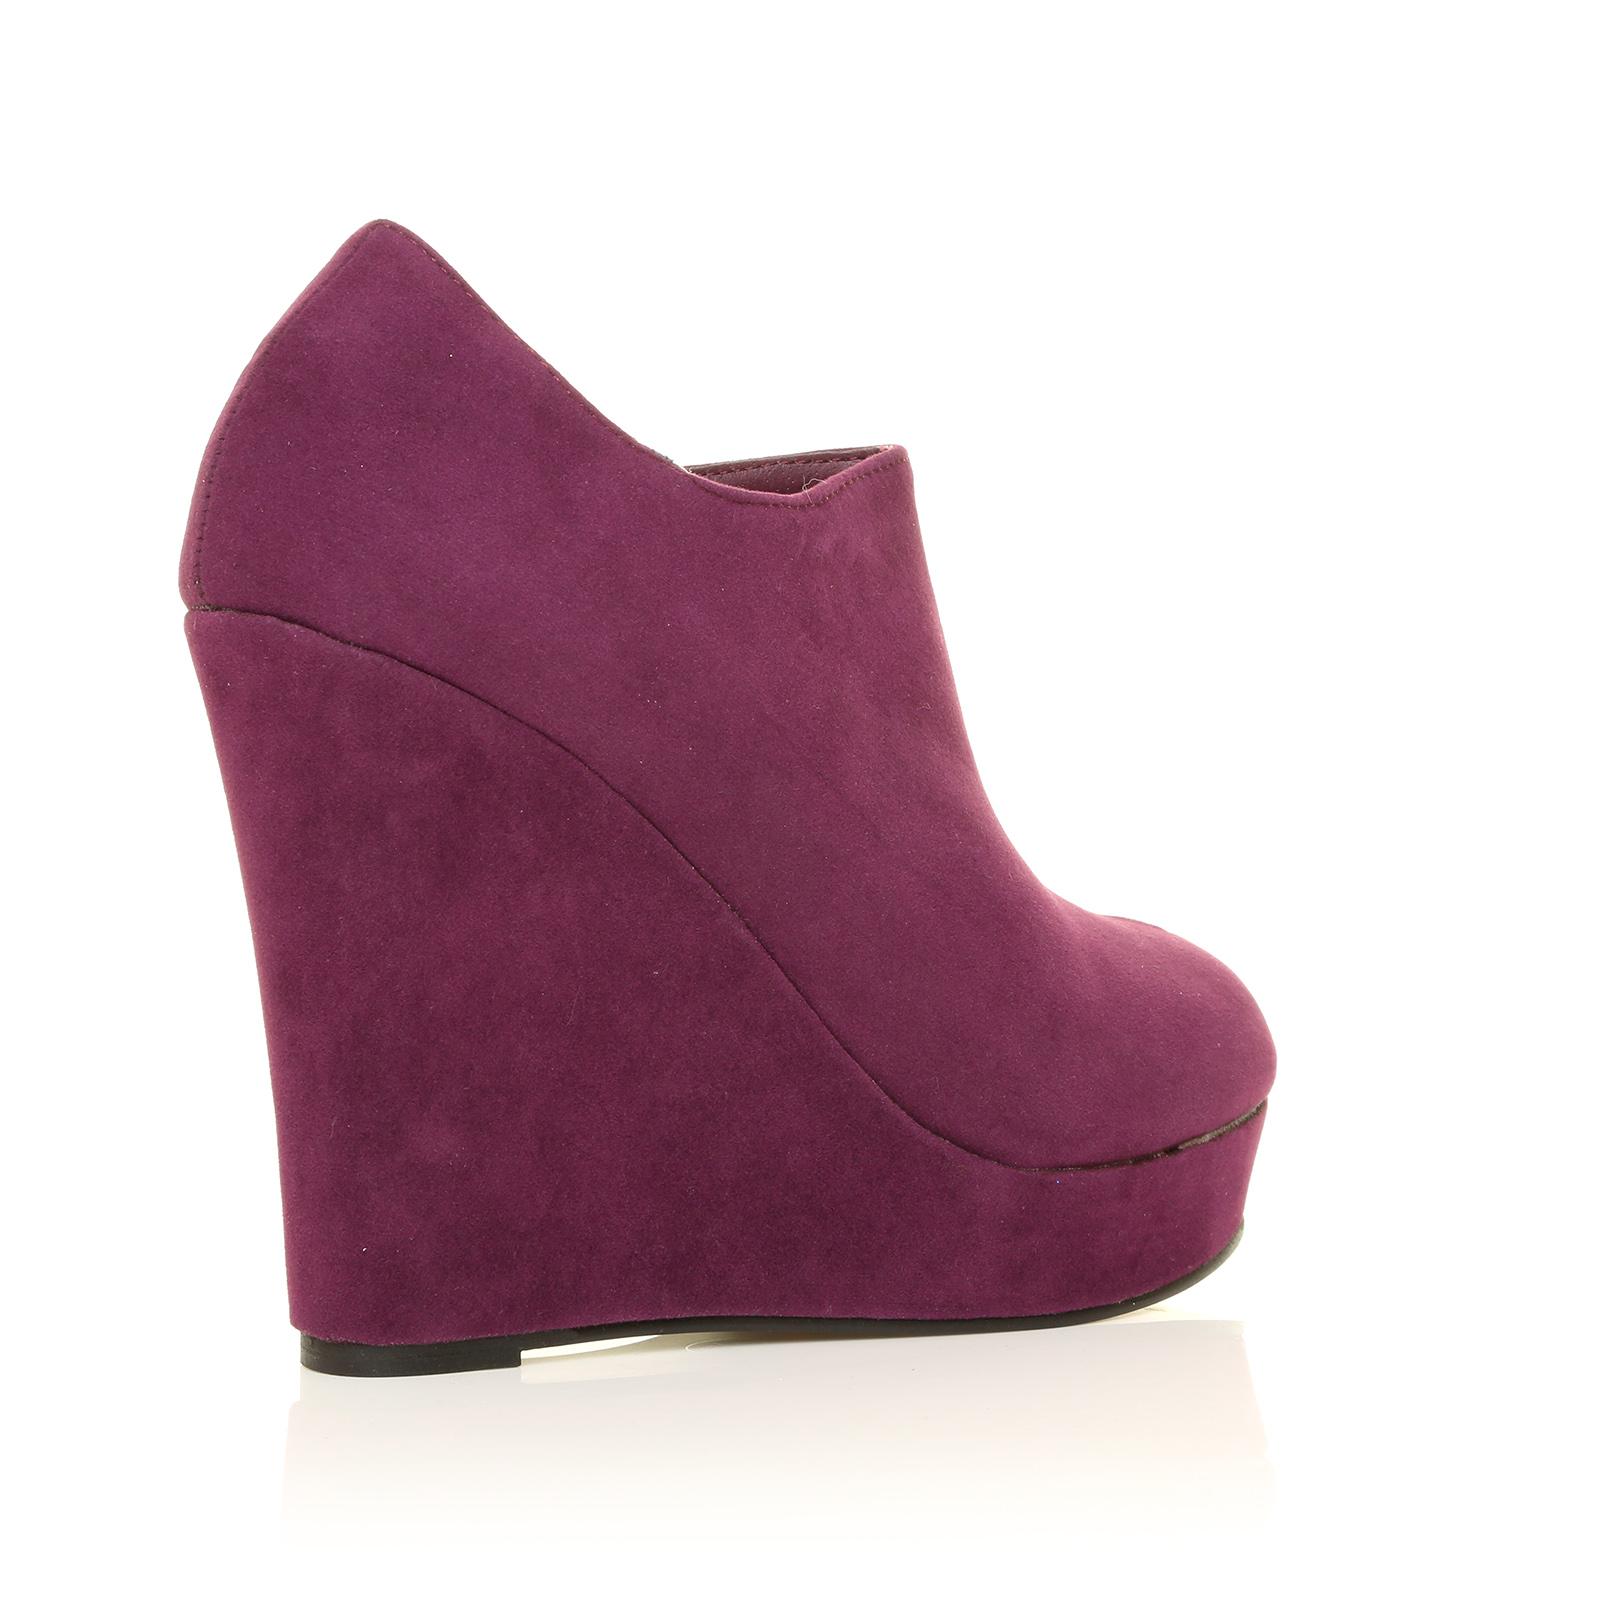 wedges womens toe high heel platform shoes